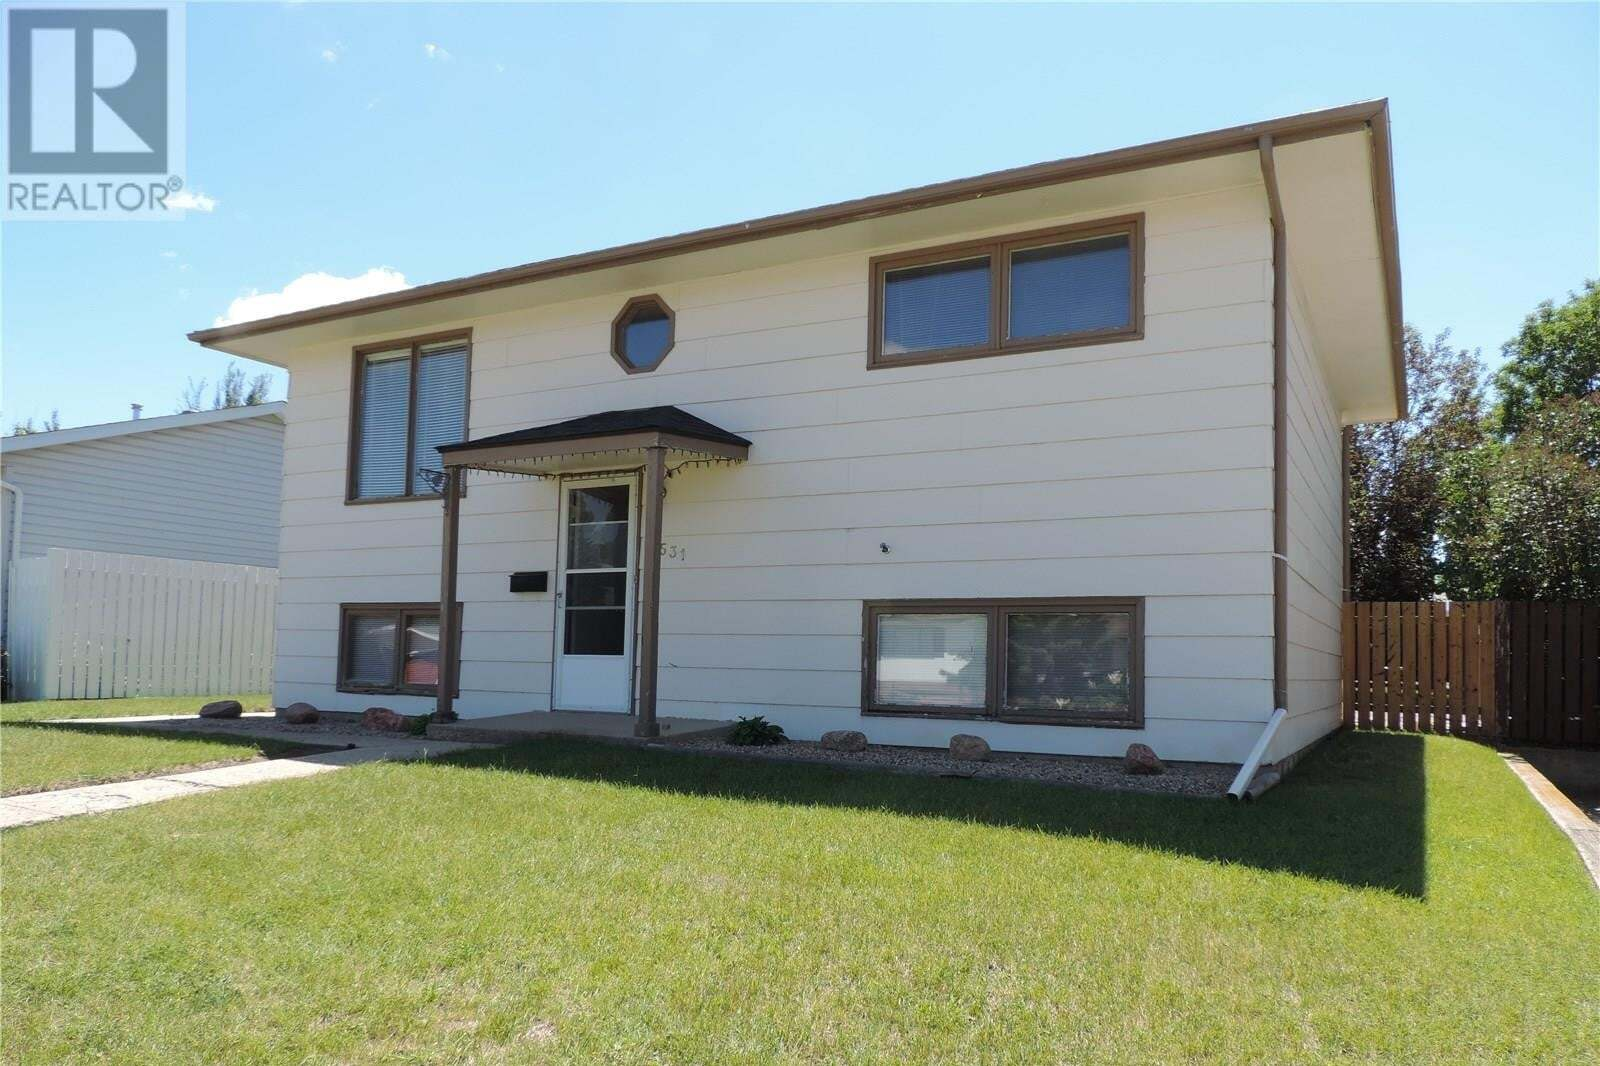 House for sale at 1531 Grandview St W Moose Jaw Saskatchewan - MLS: SK813951